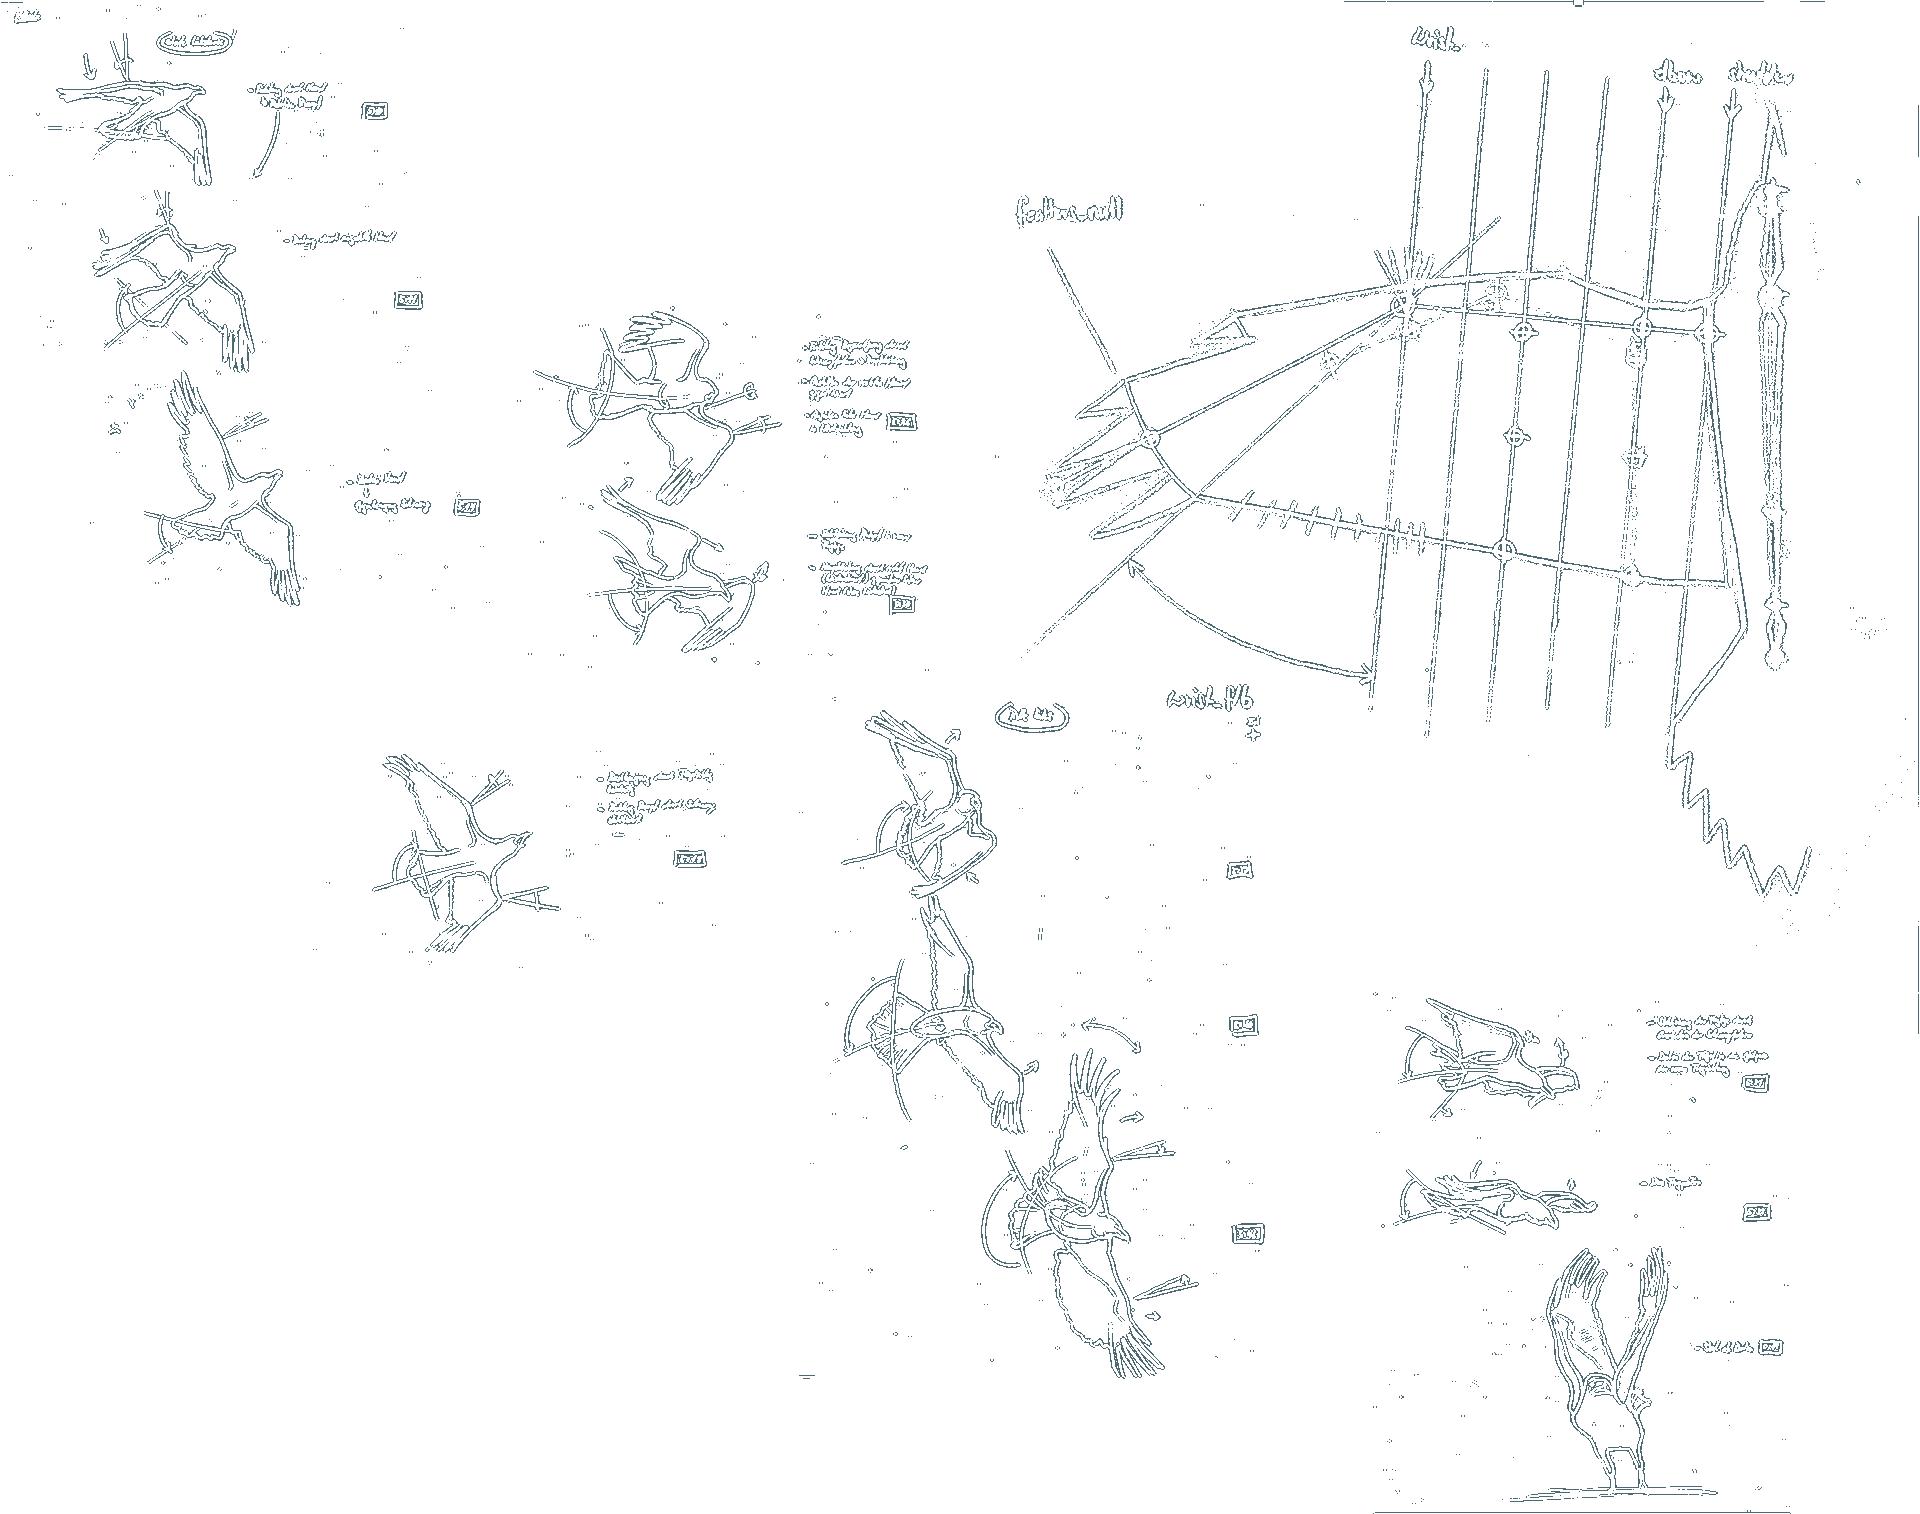 Birdly, Skizzen Voeglflug, ikonaut